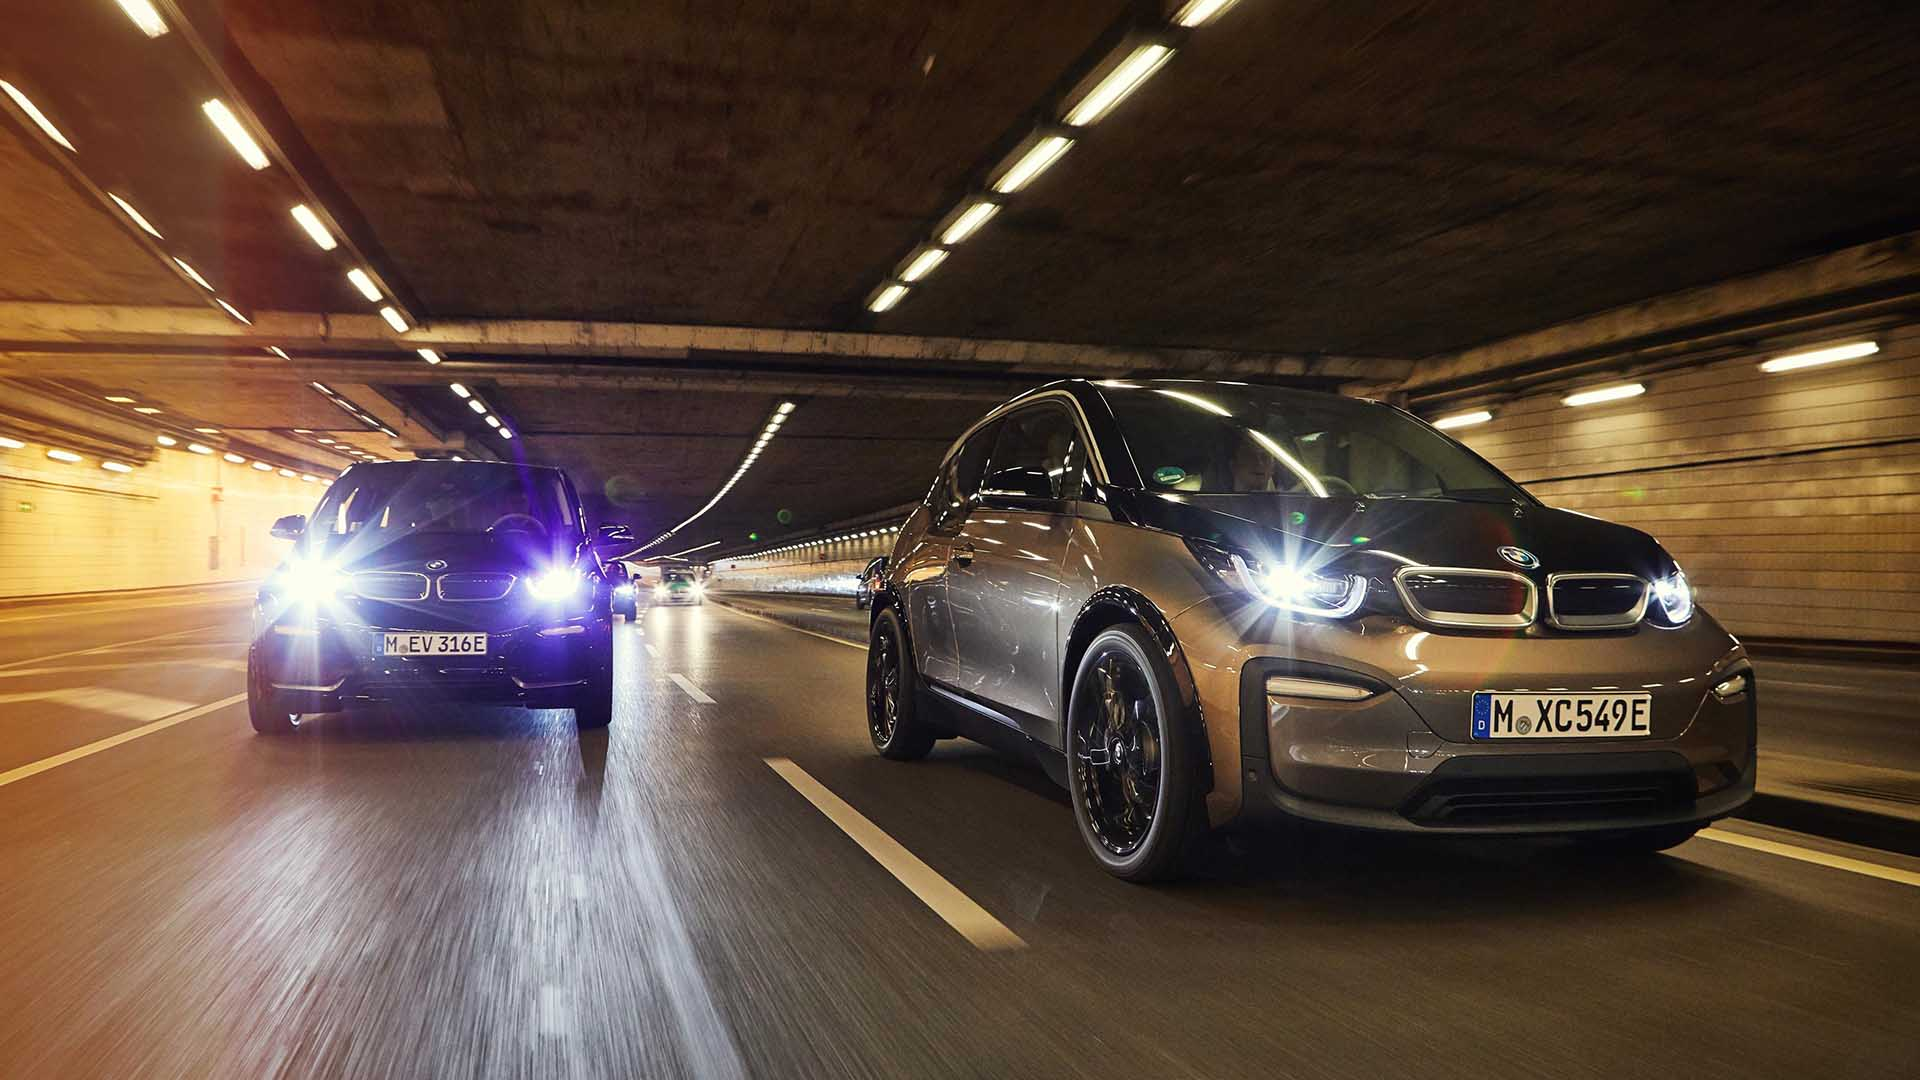 BMW i3 – 182 to 188 miles